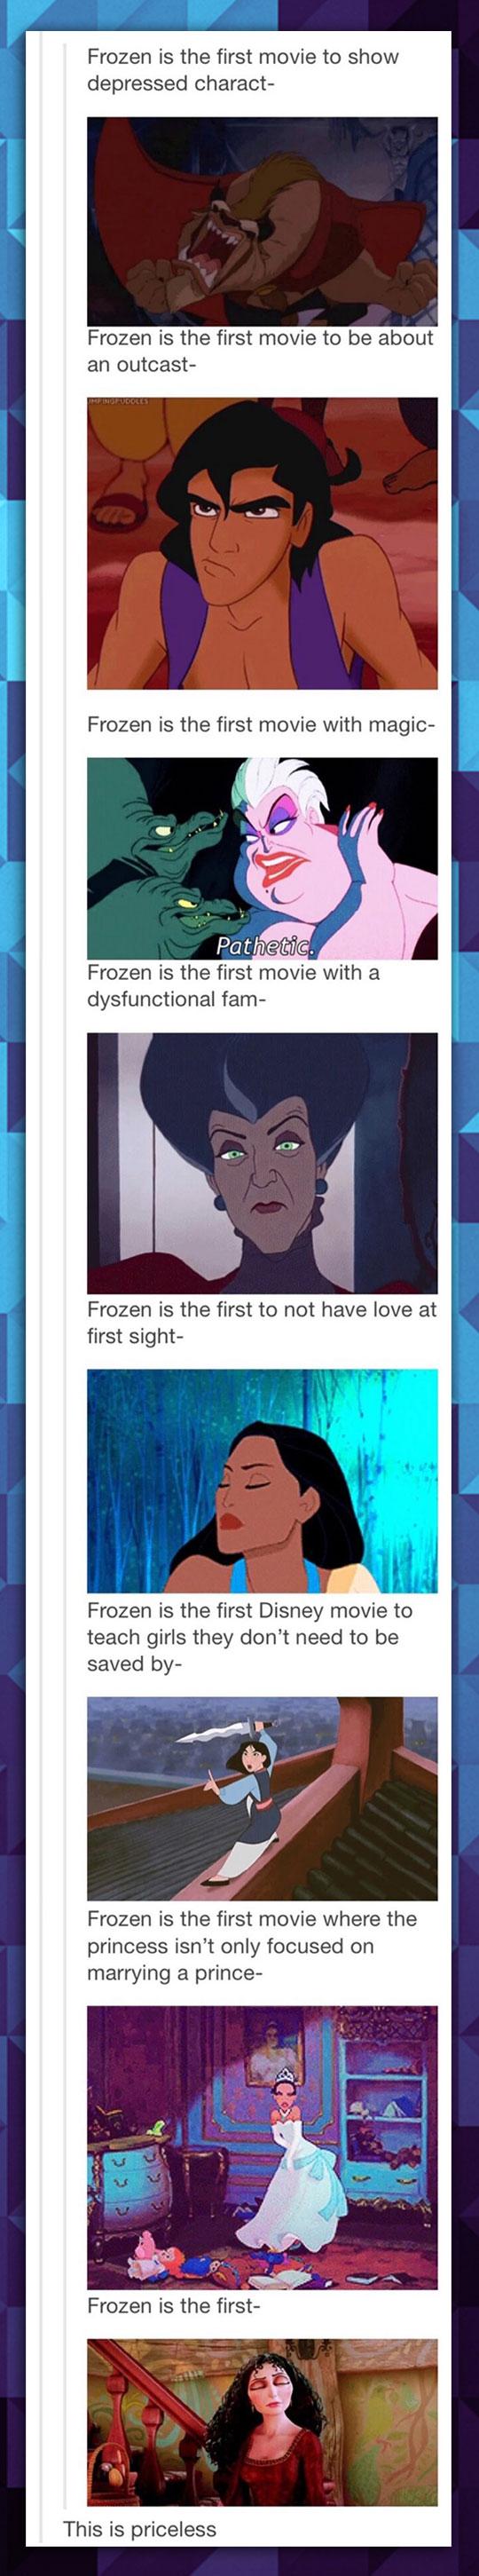 funny-disney-movies-frozen-fake